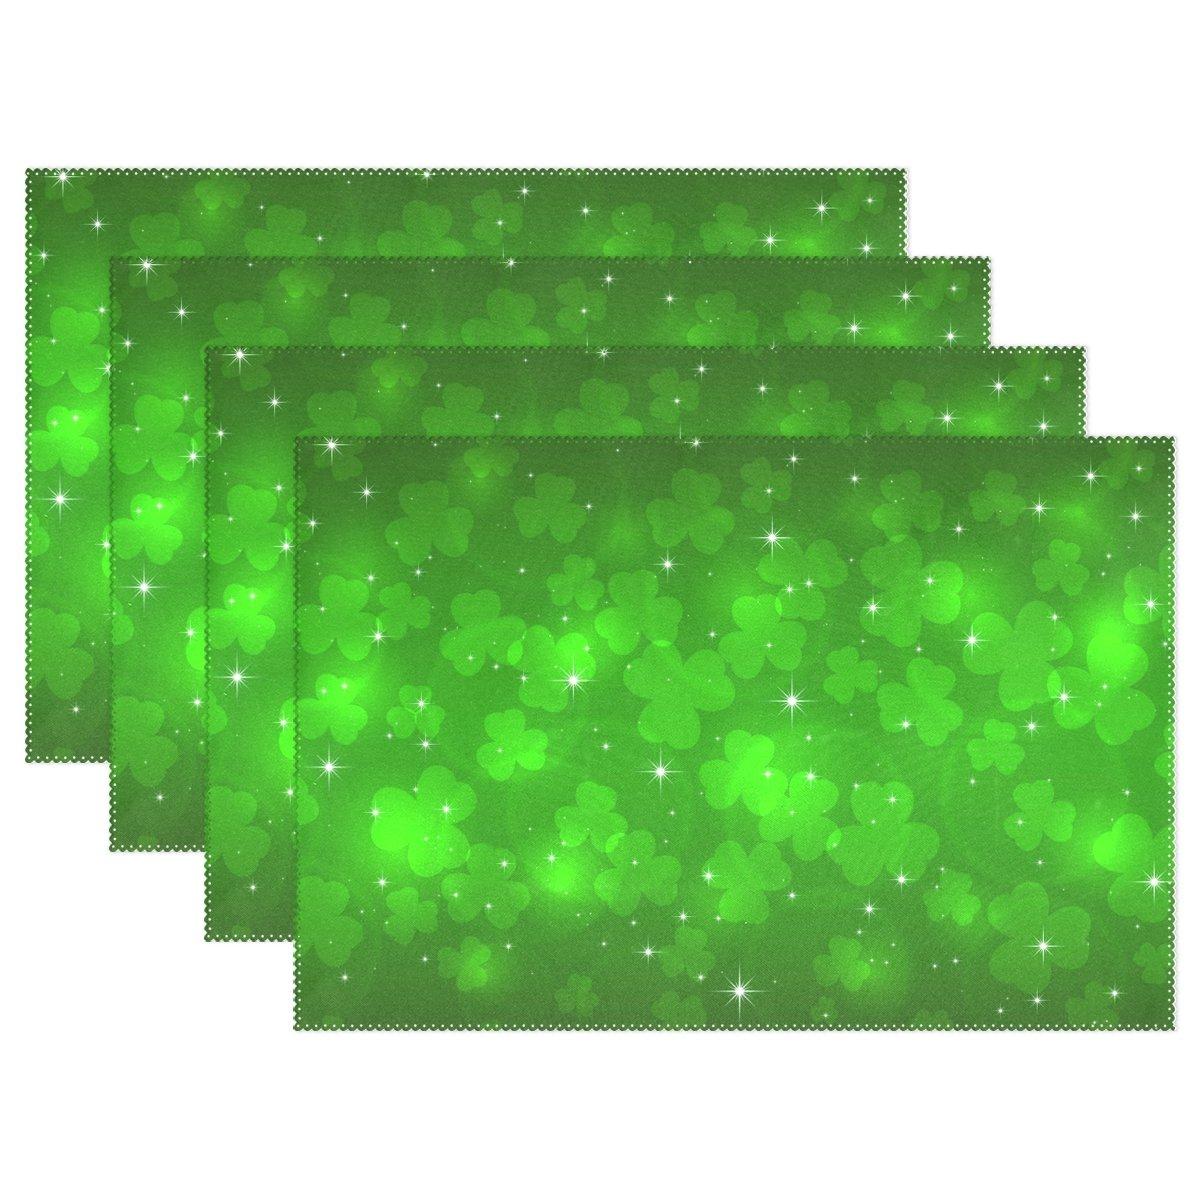 My Dailyグリーンクローバー星聖パトリックの日プレースマットのダイニングテーブルのセット4耐熱性洗濯可能ポリエステルキッチンテーブルマット 12 x 18 inch 6  B0797RK1QR